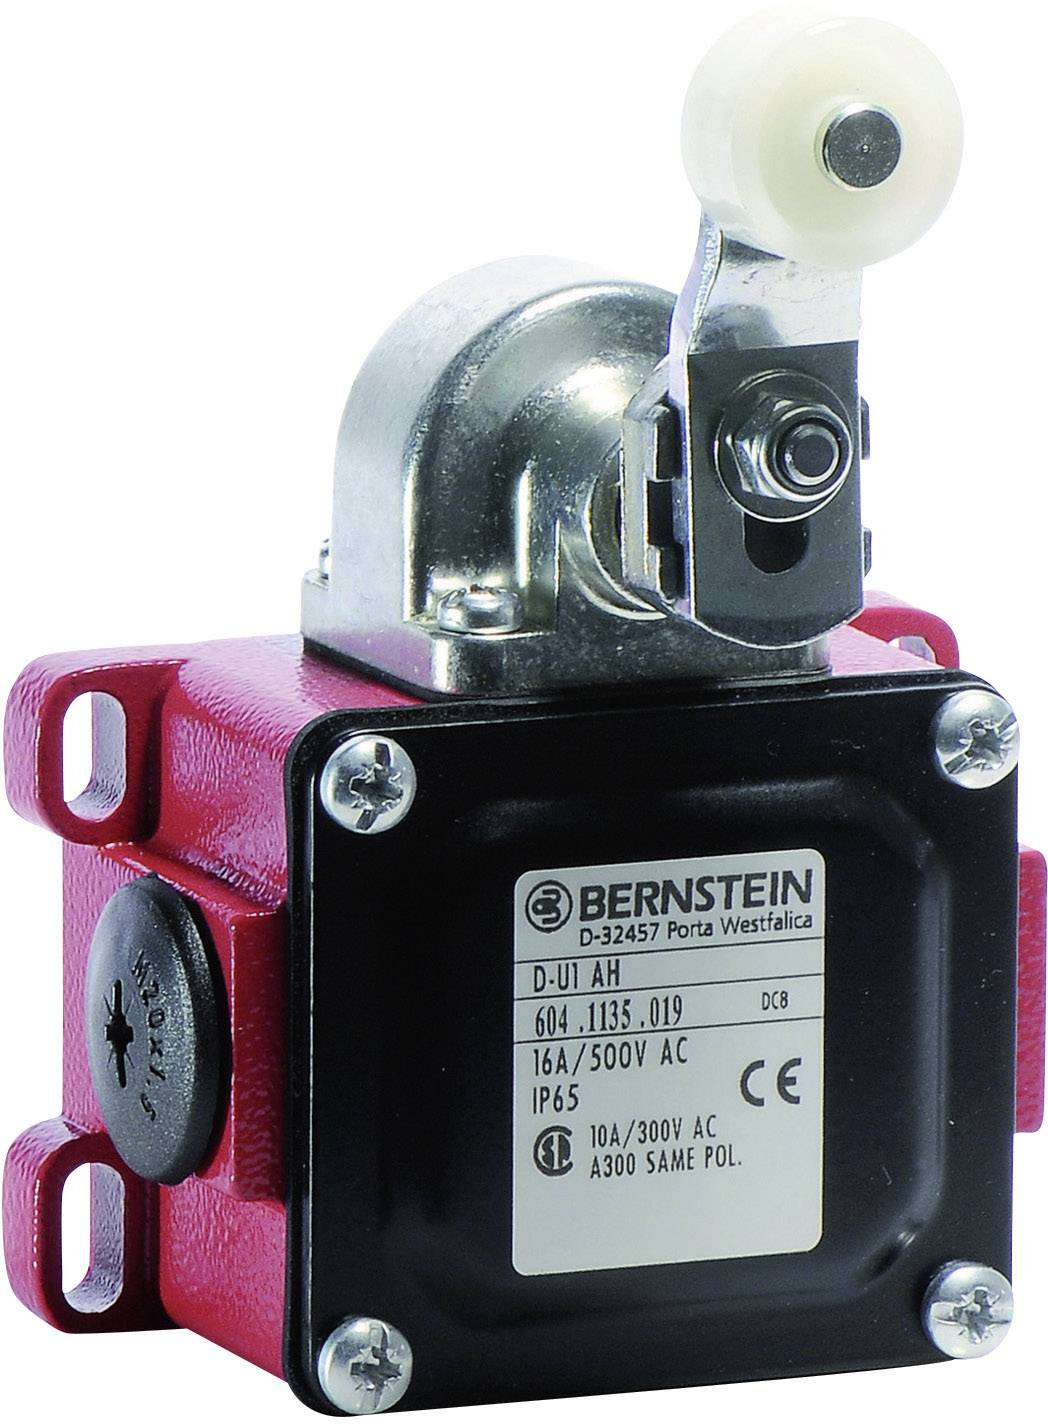 TRU COMPONENTS XZ-9//110 Endschalter 250 V//AC 10A Rollenschwenkhebel tastend IP65